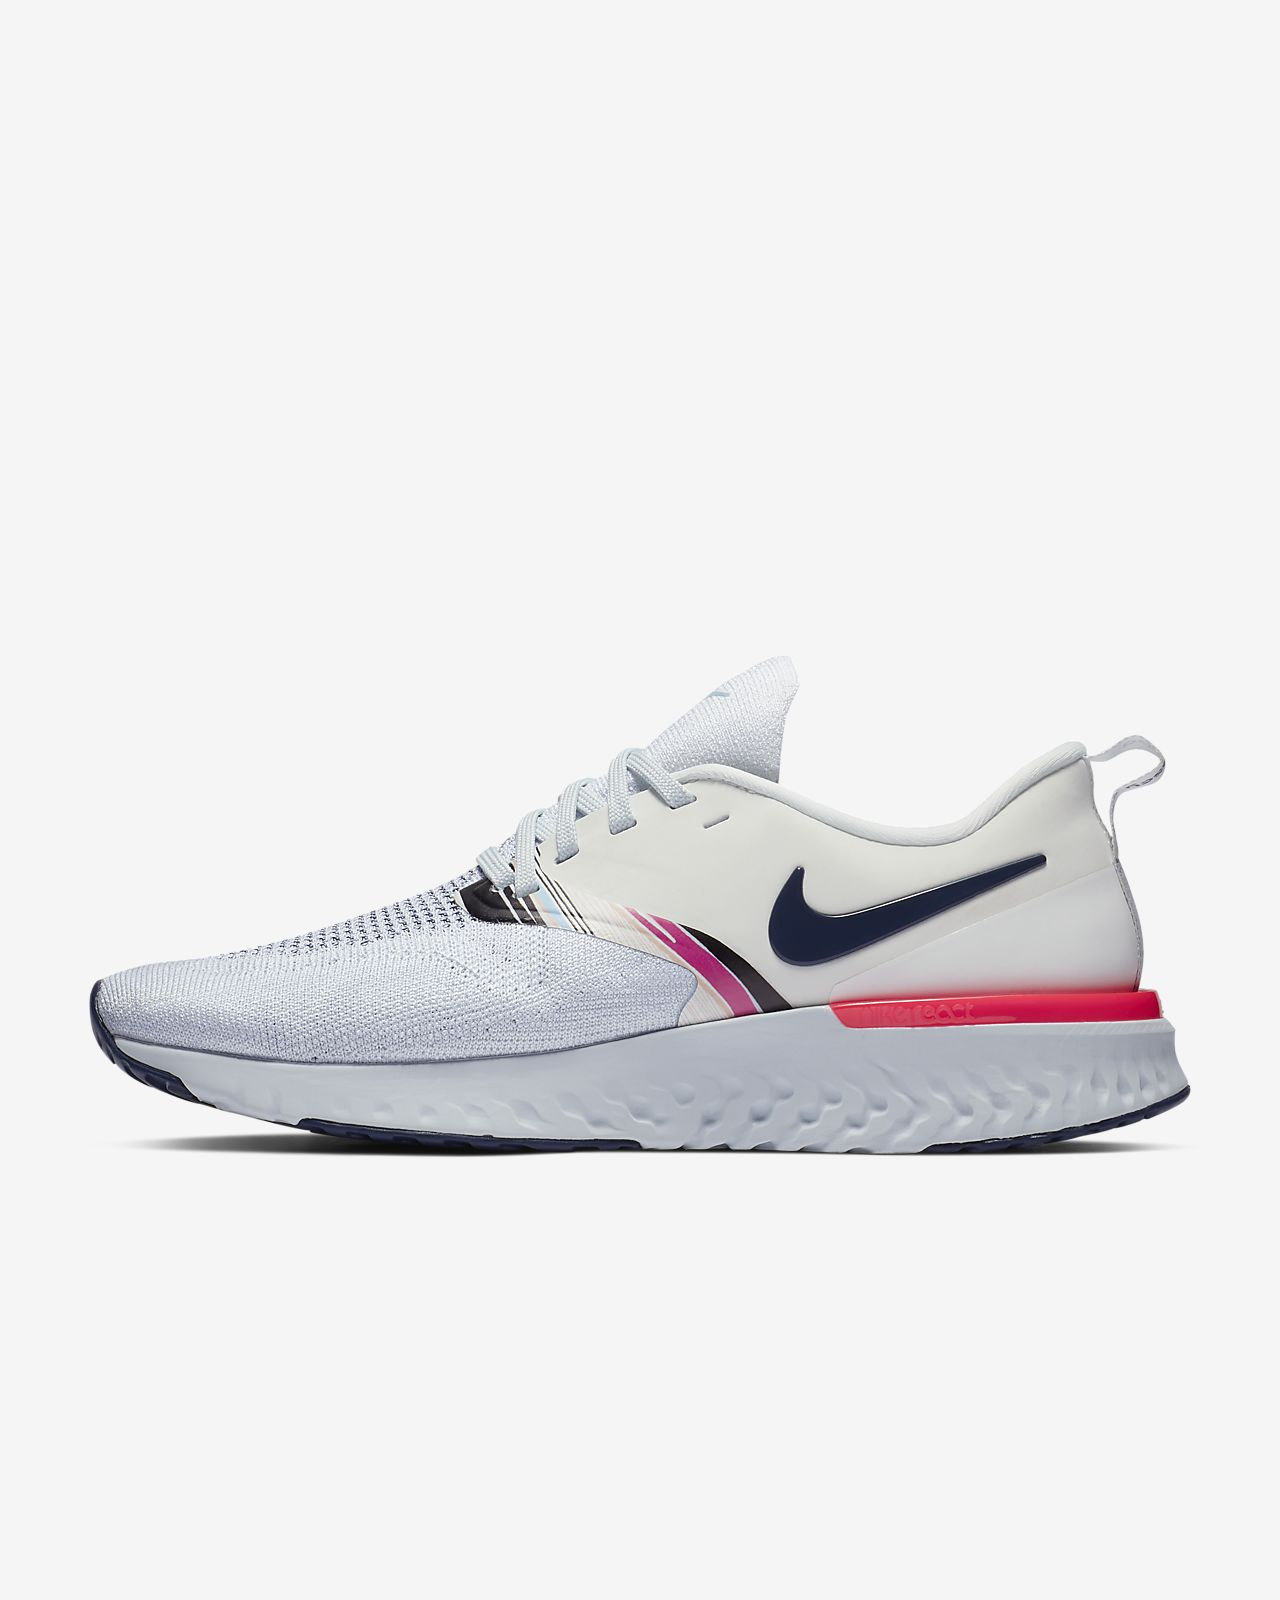 innovative design 3b9ba 07e64 Nike Odyssey React Flyknit 2 Premium-løbesko til kvinder. Nike.com DK